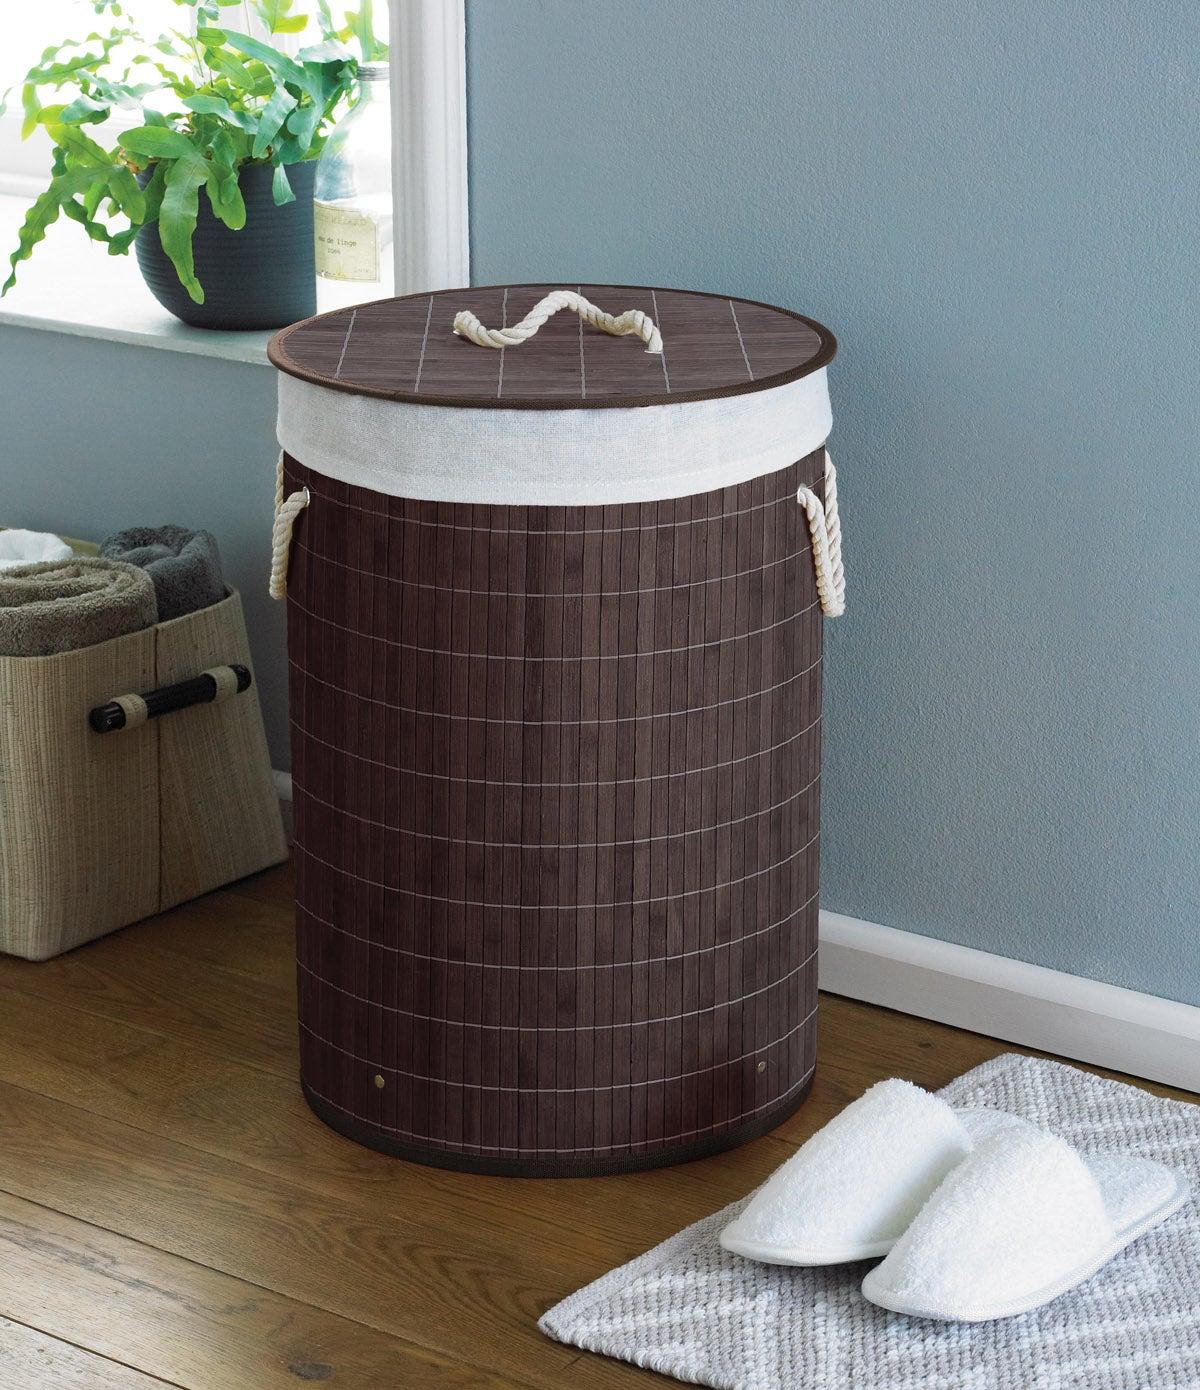 Country Club Round Bamboo Laundry Basket, Dark Brown